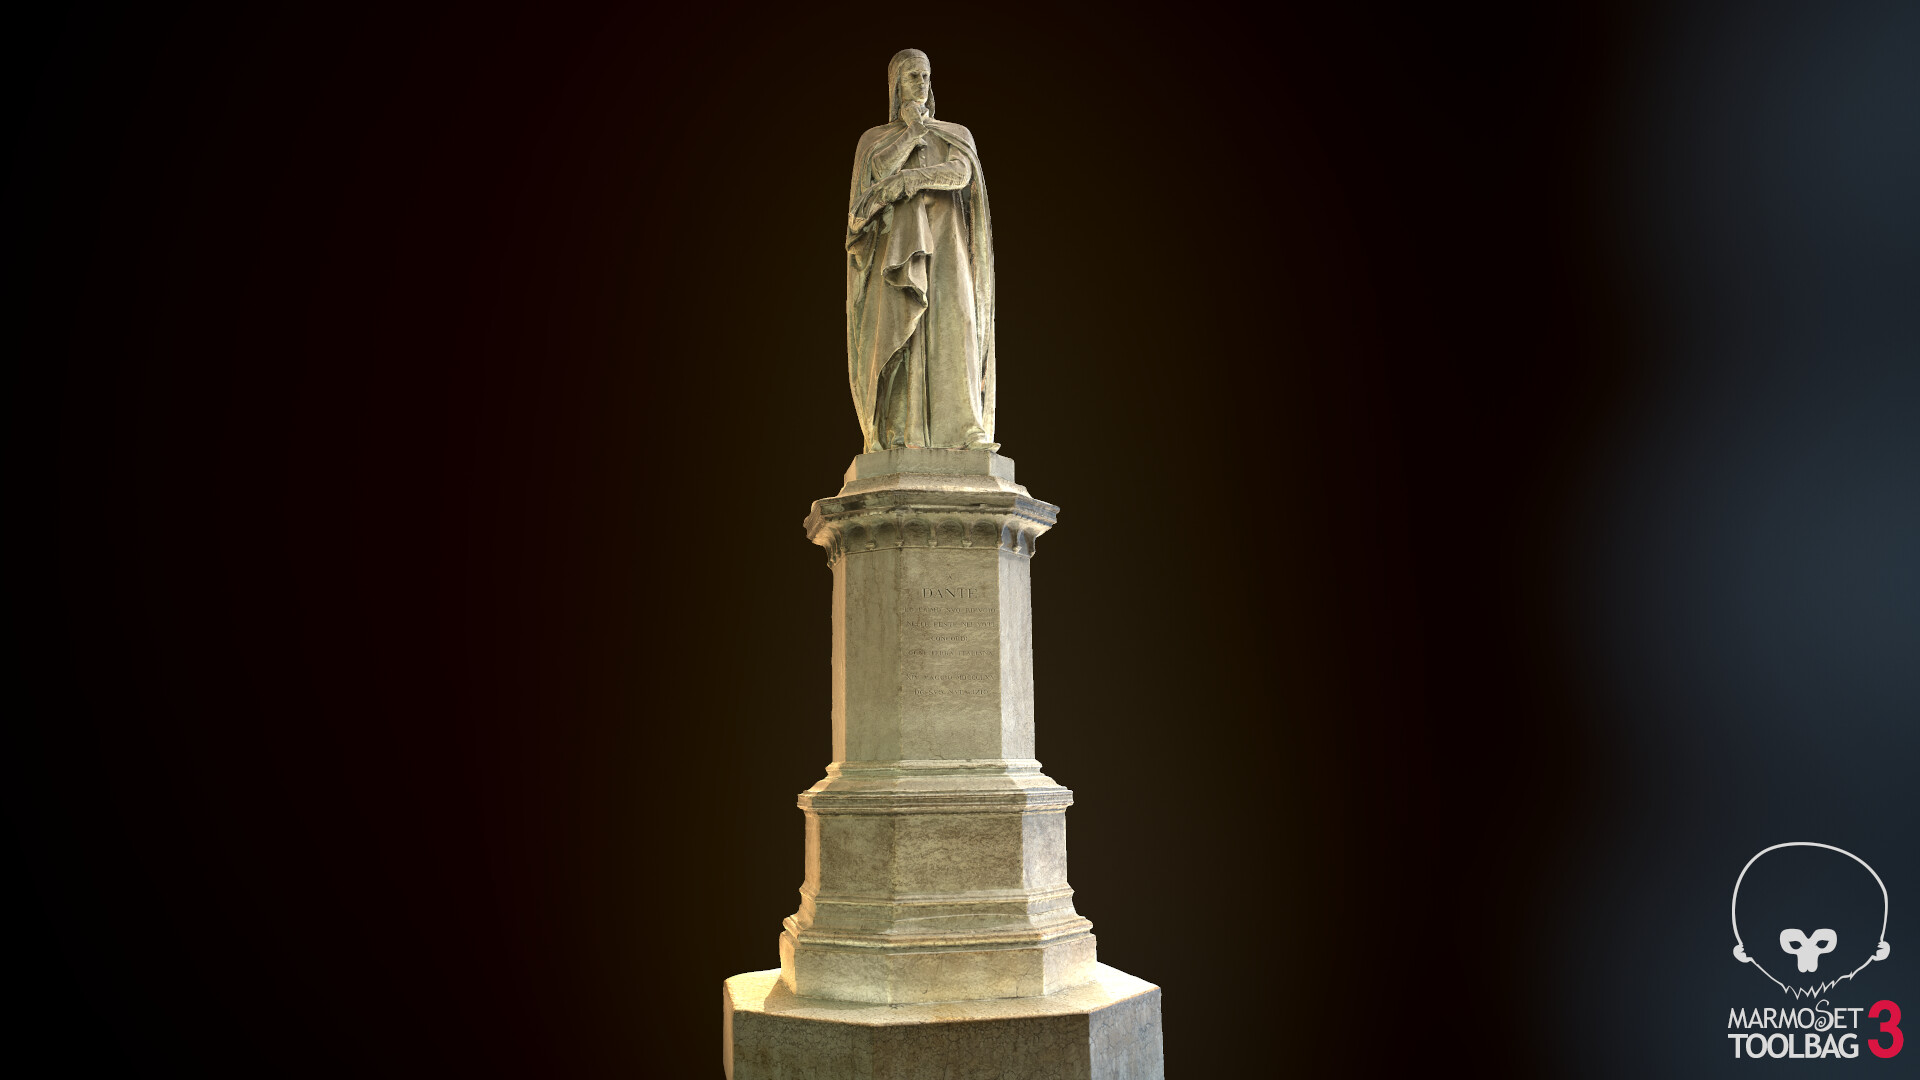 ArtStation - photogrammetry : GameReady statue, Nabil Kechiche